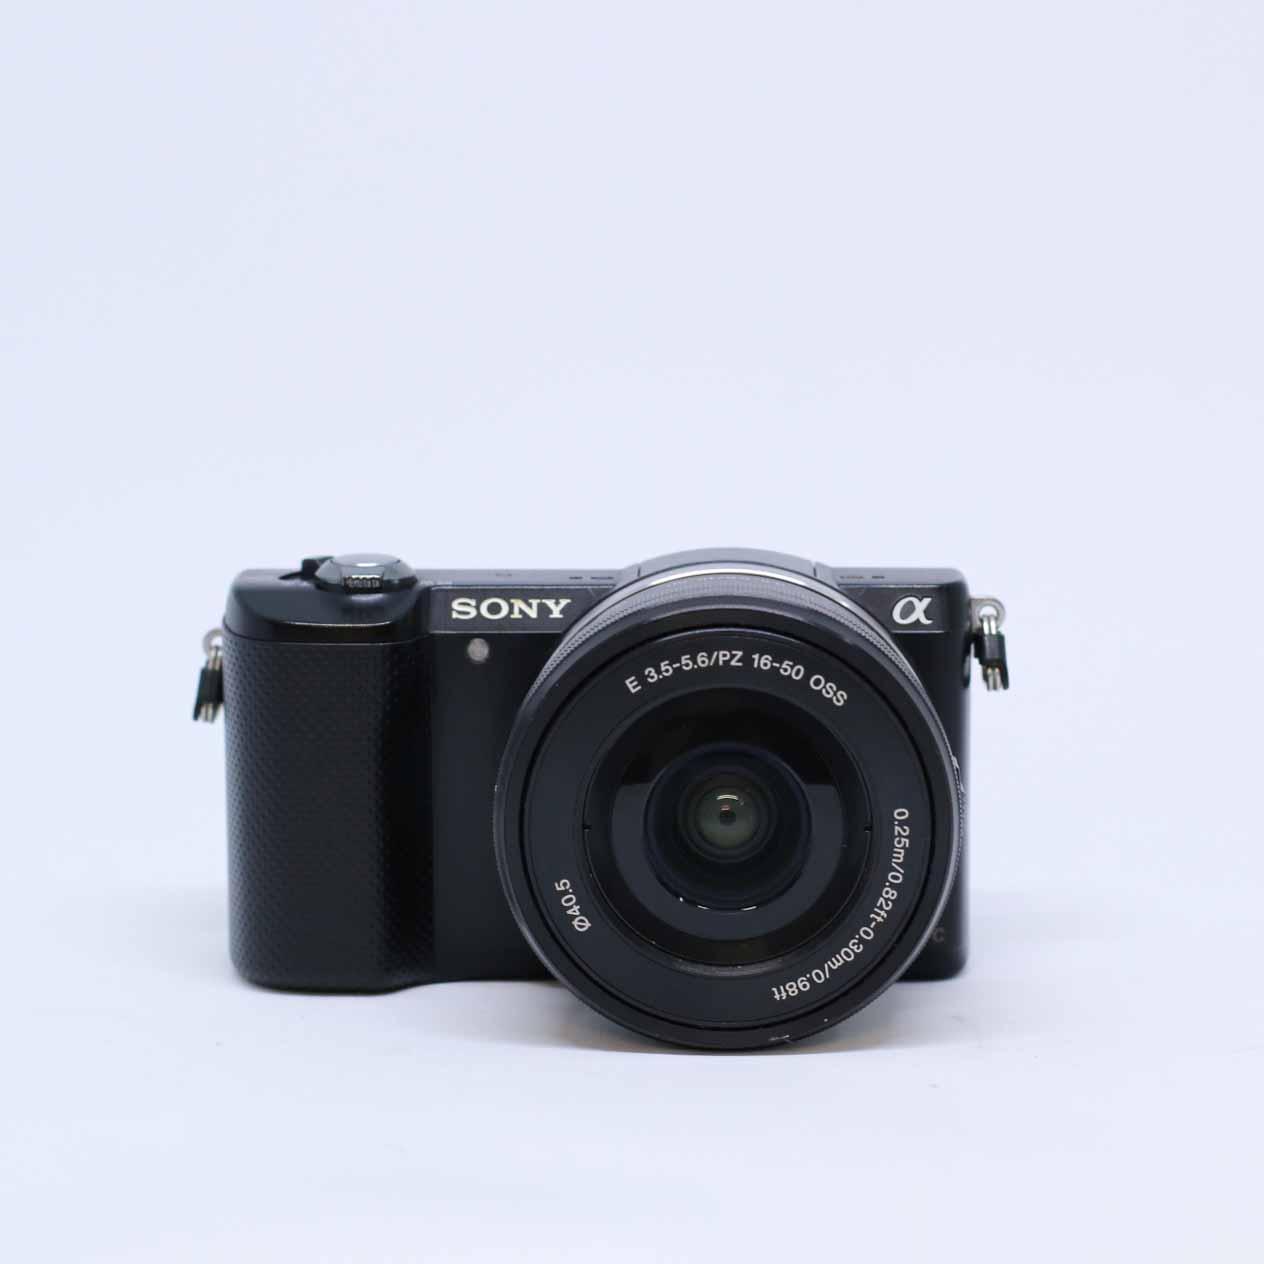 Sony A5000 + 16-50mm F3.5-5.6 OSS